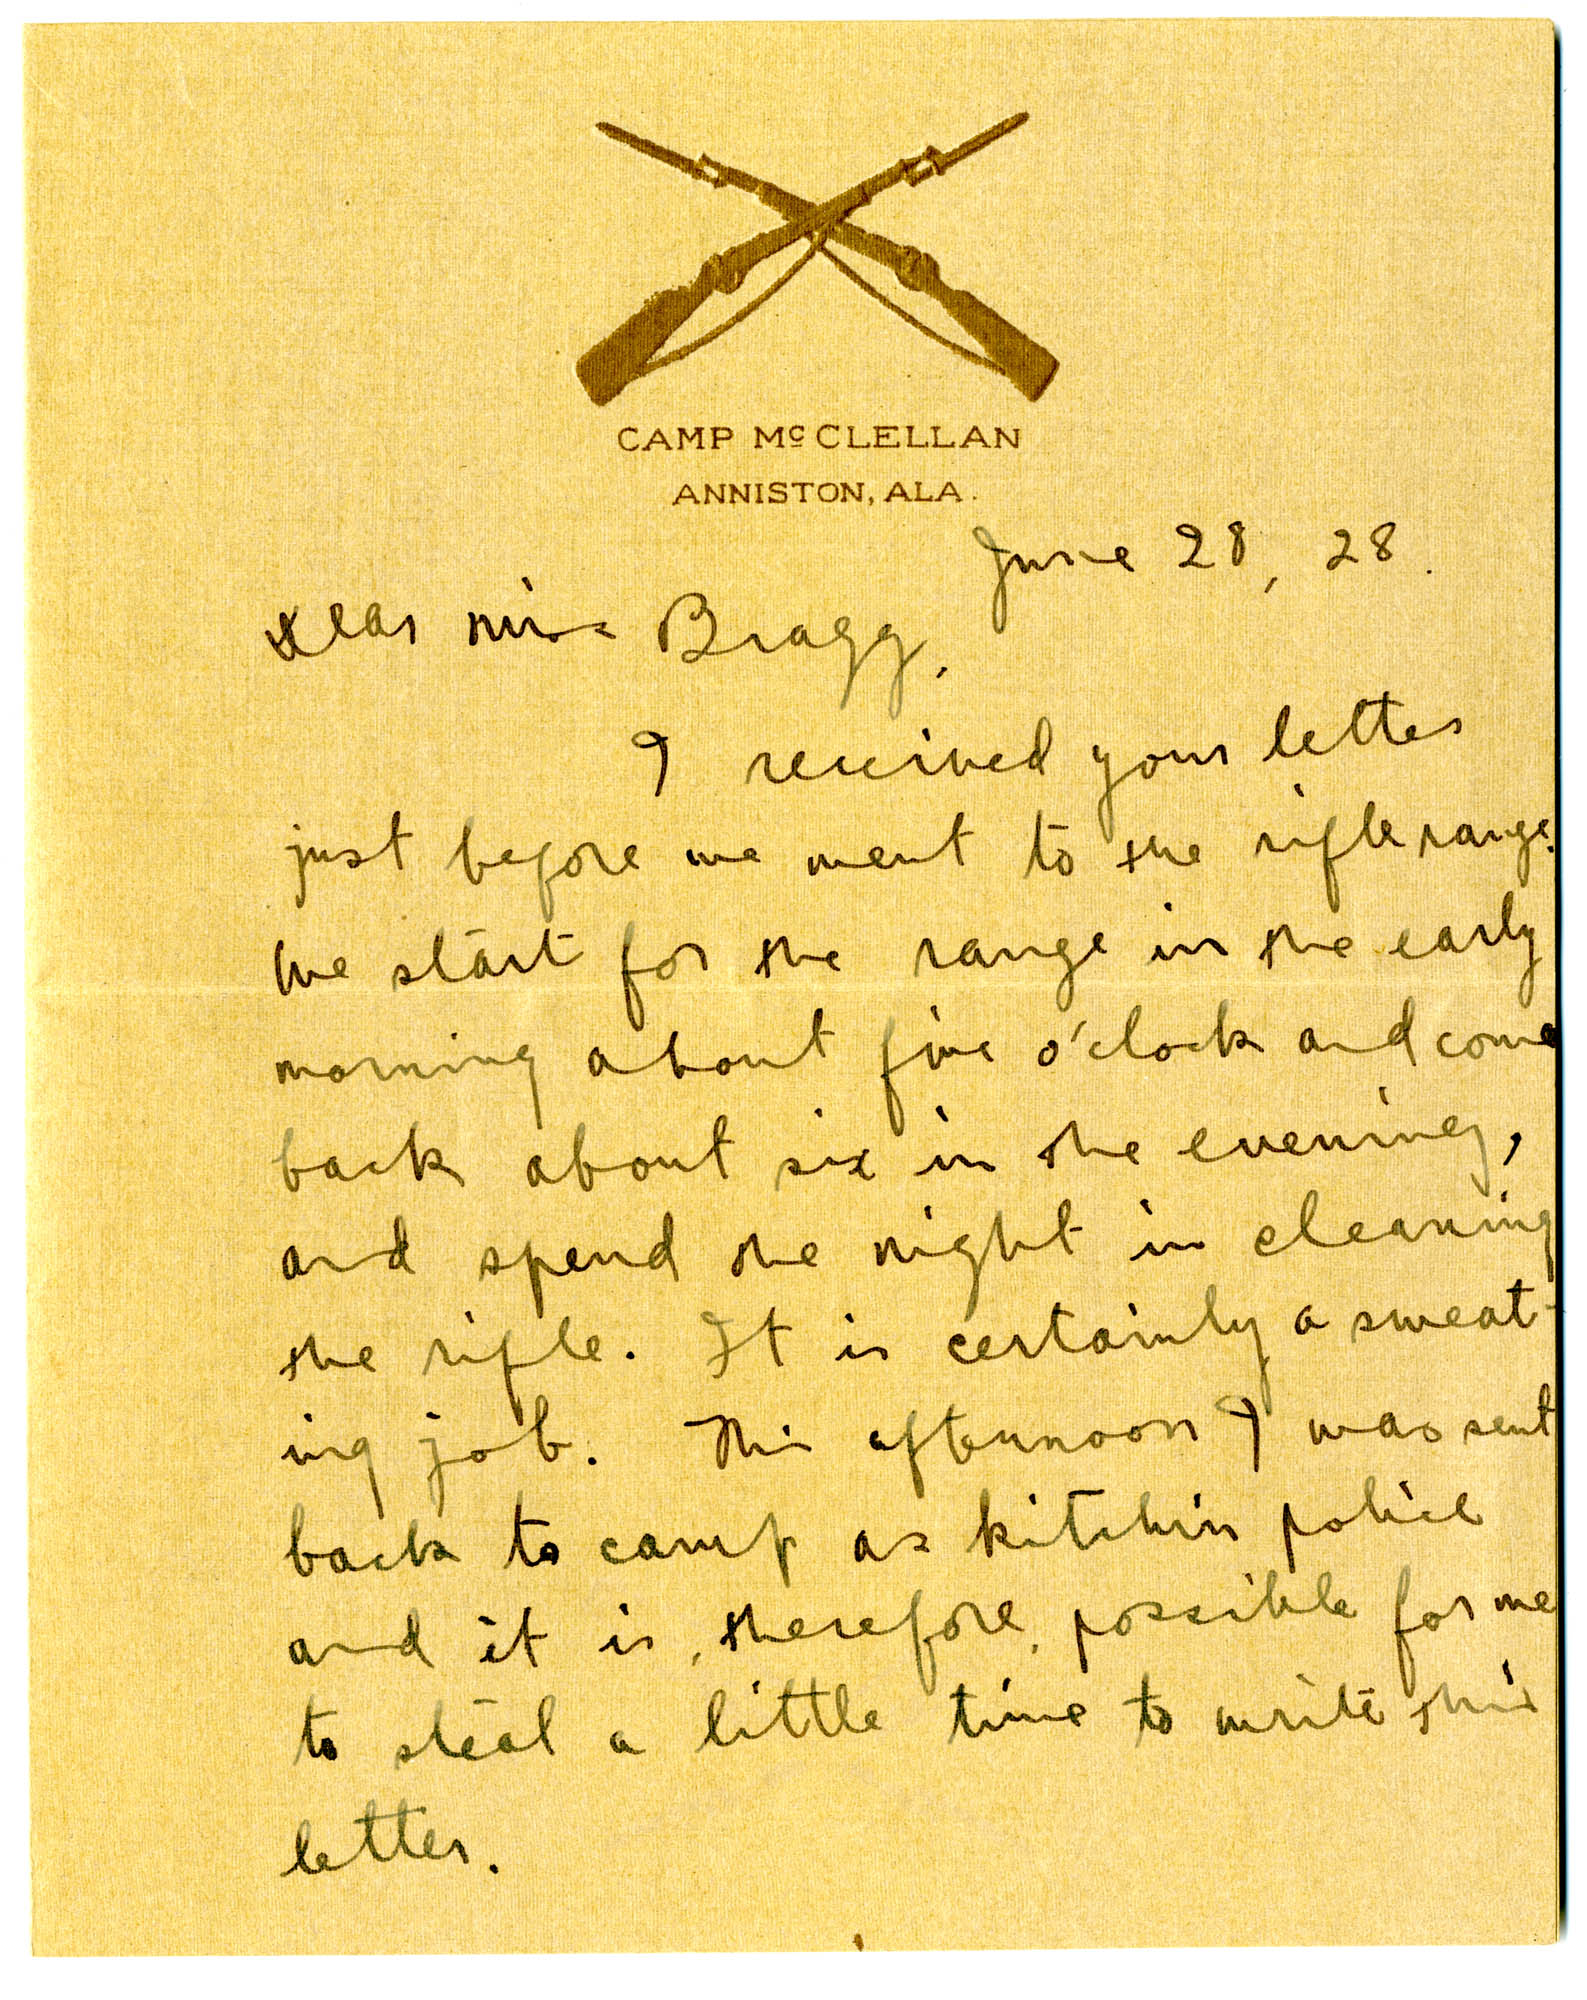 Letter from C.C. Tseng to Laura M. Bragg, June 28, 1928